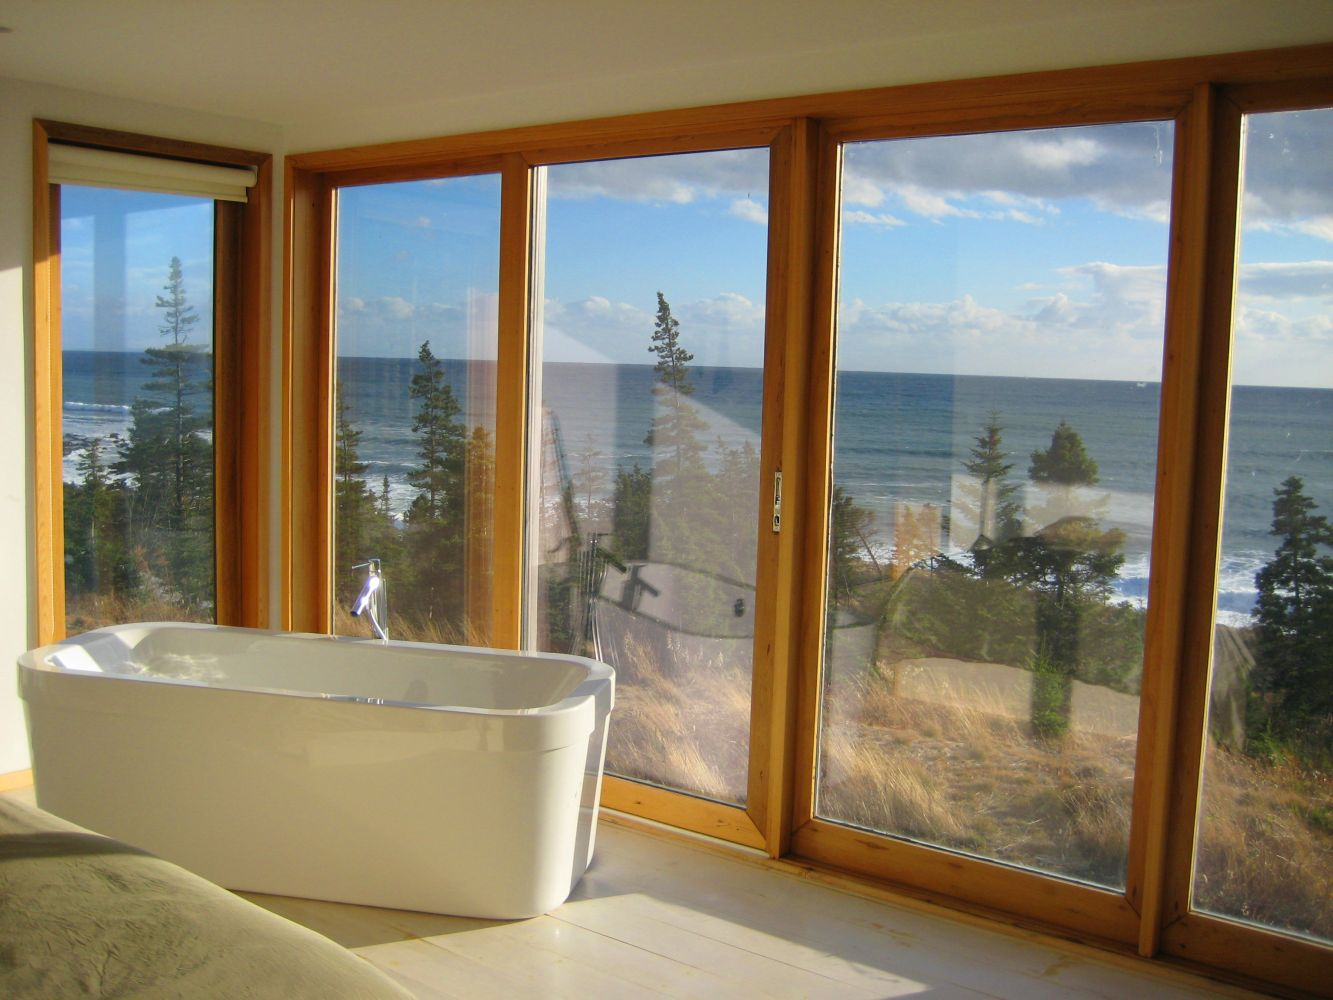 Ocean View Property For Sale Nova Scotia